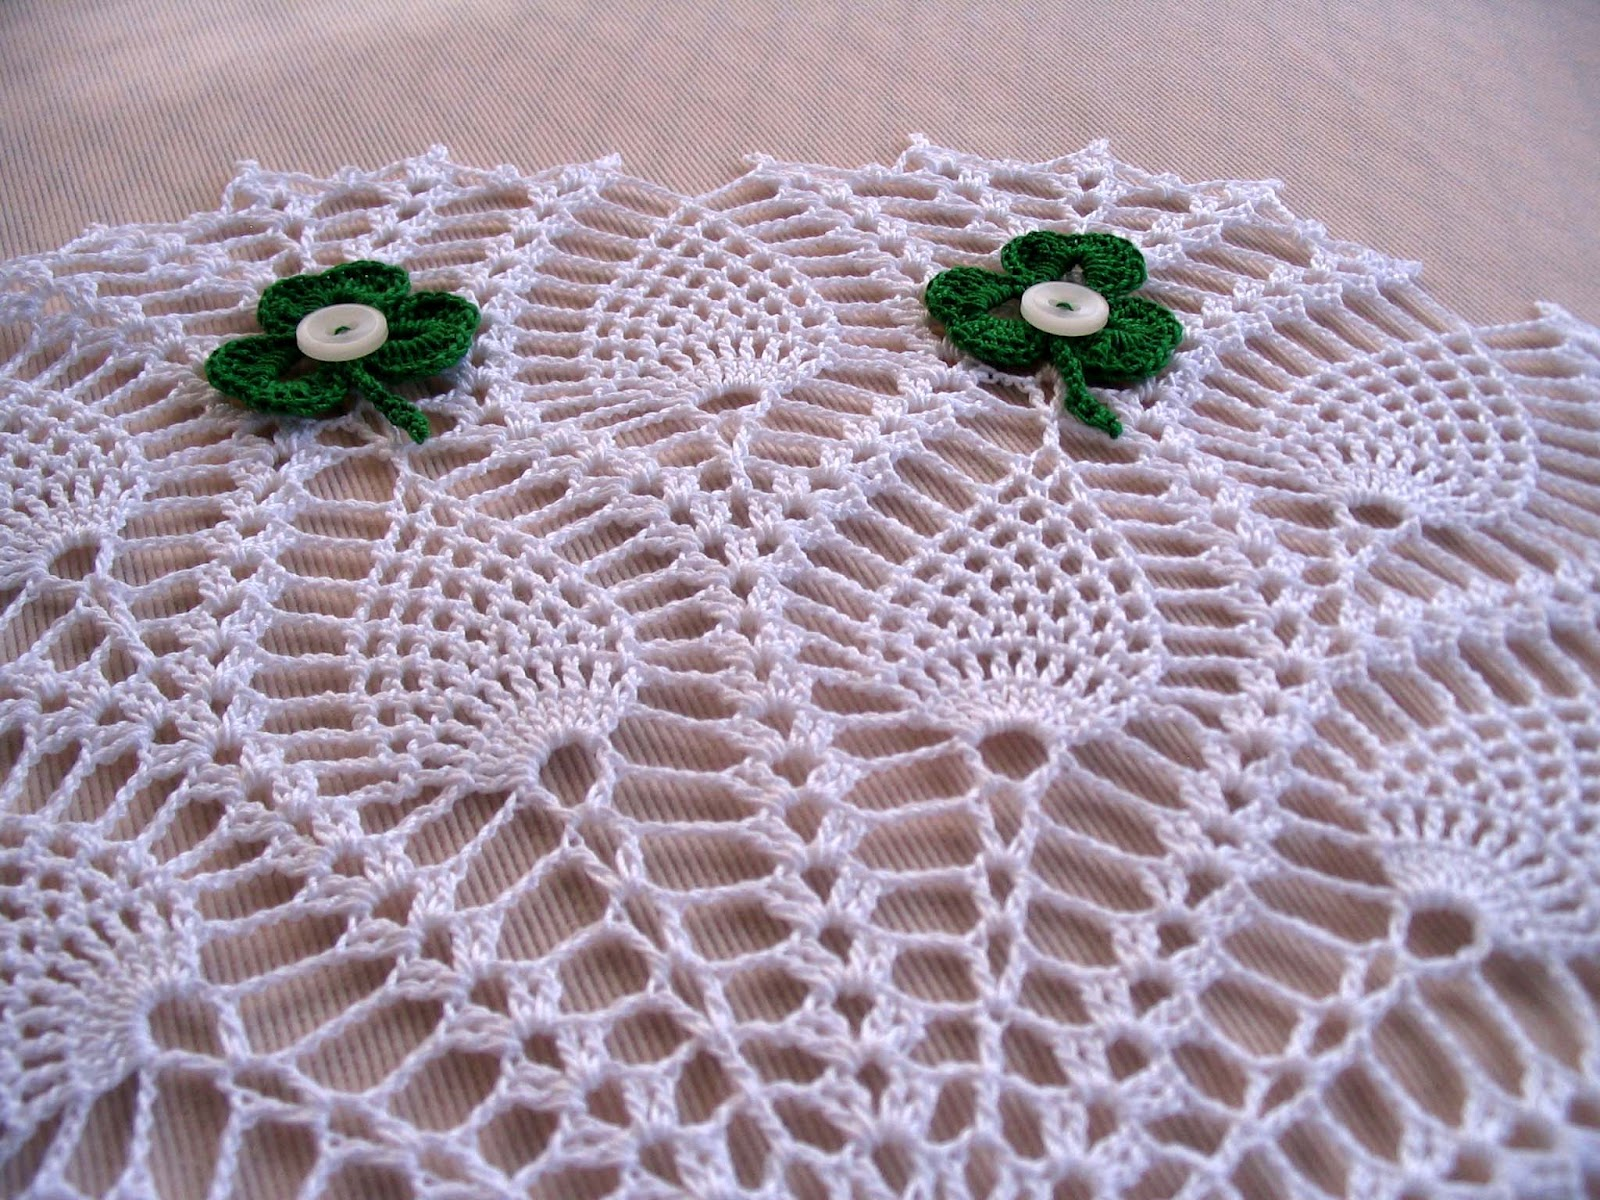 Linda Crochets: March 2012